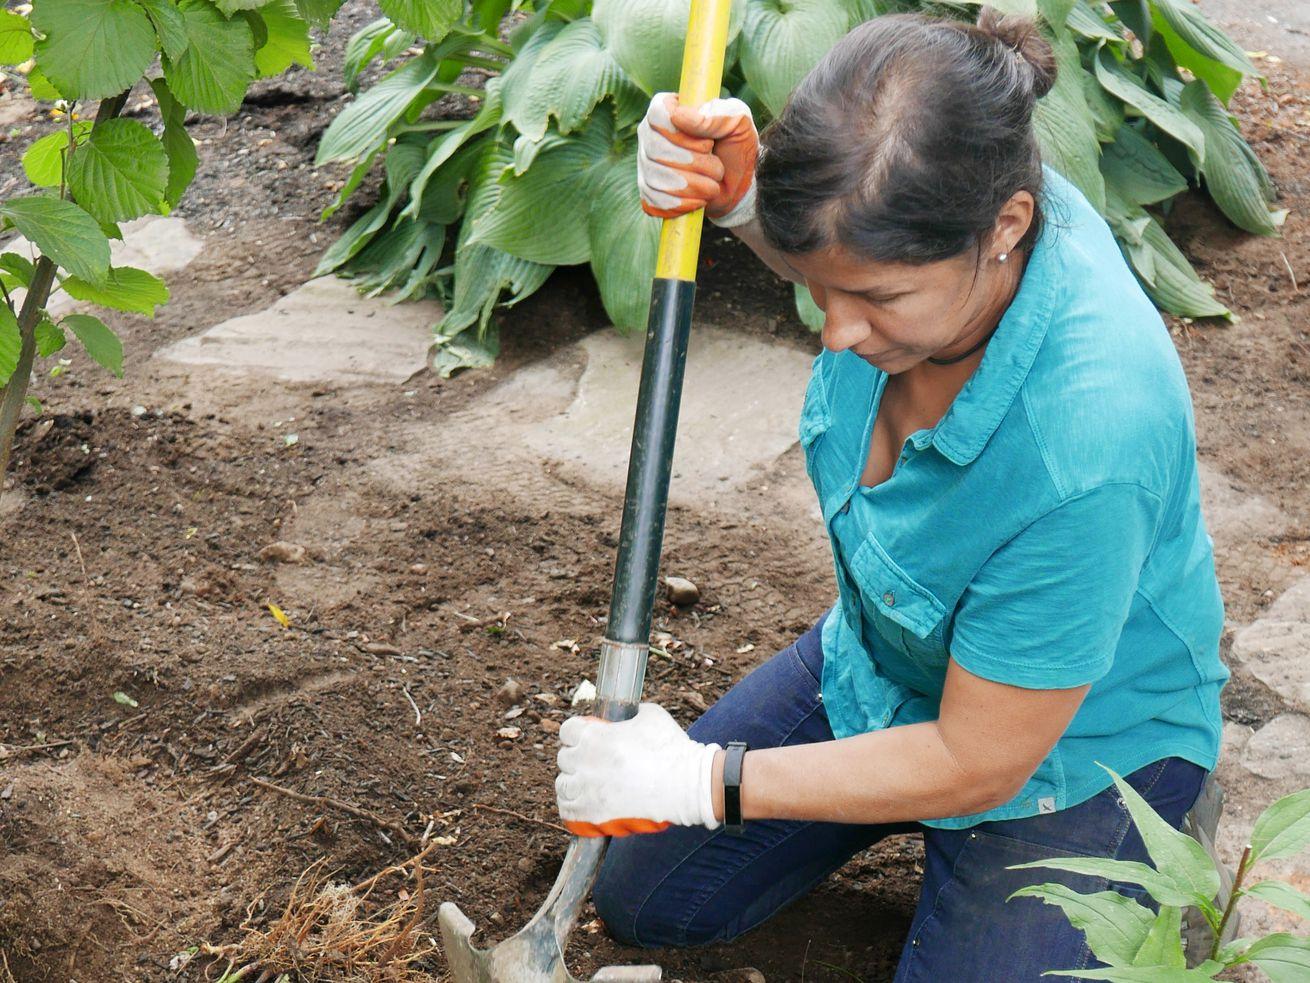 Fall 2021 Landscaping, Fall prep, Jenn Nawada digs a hole for coneflower transplants